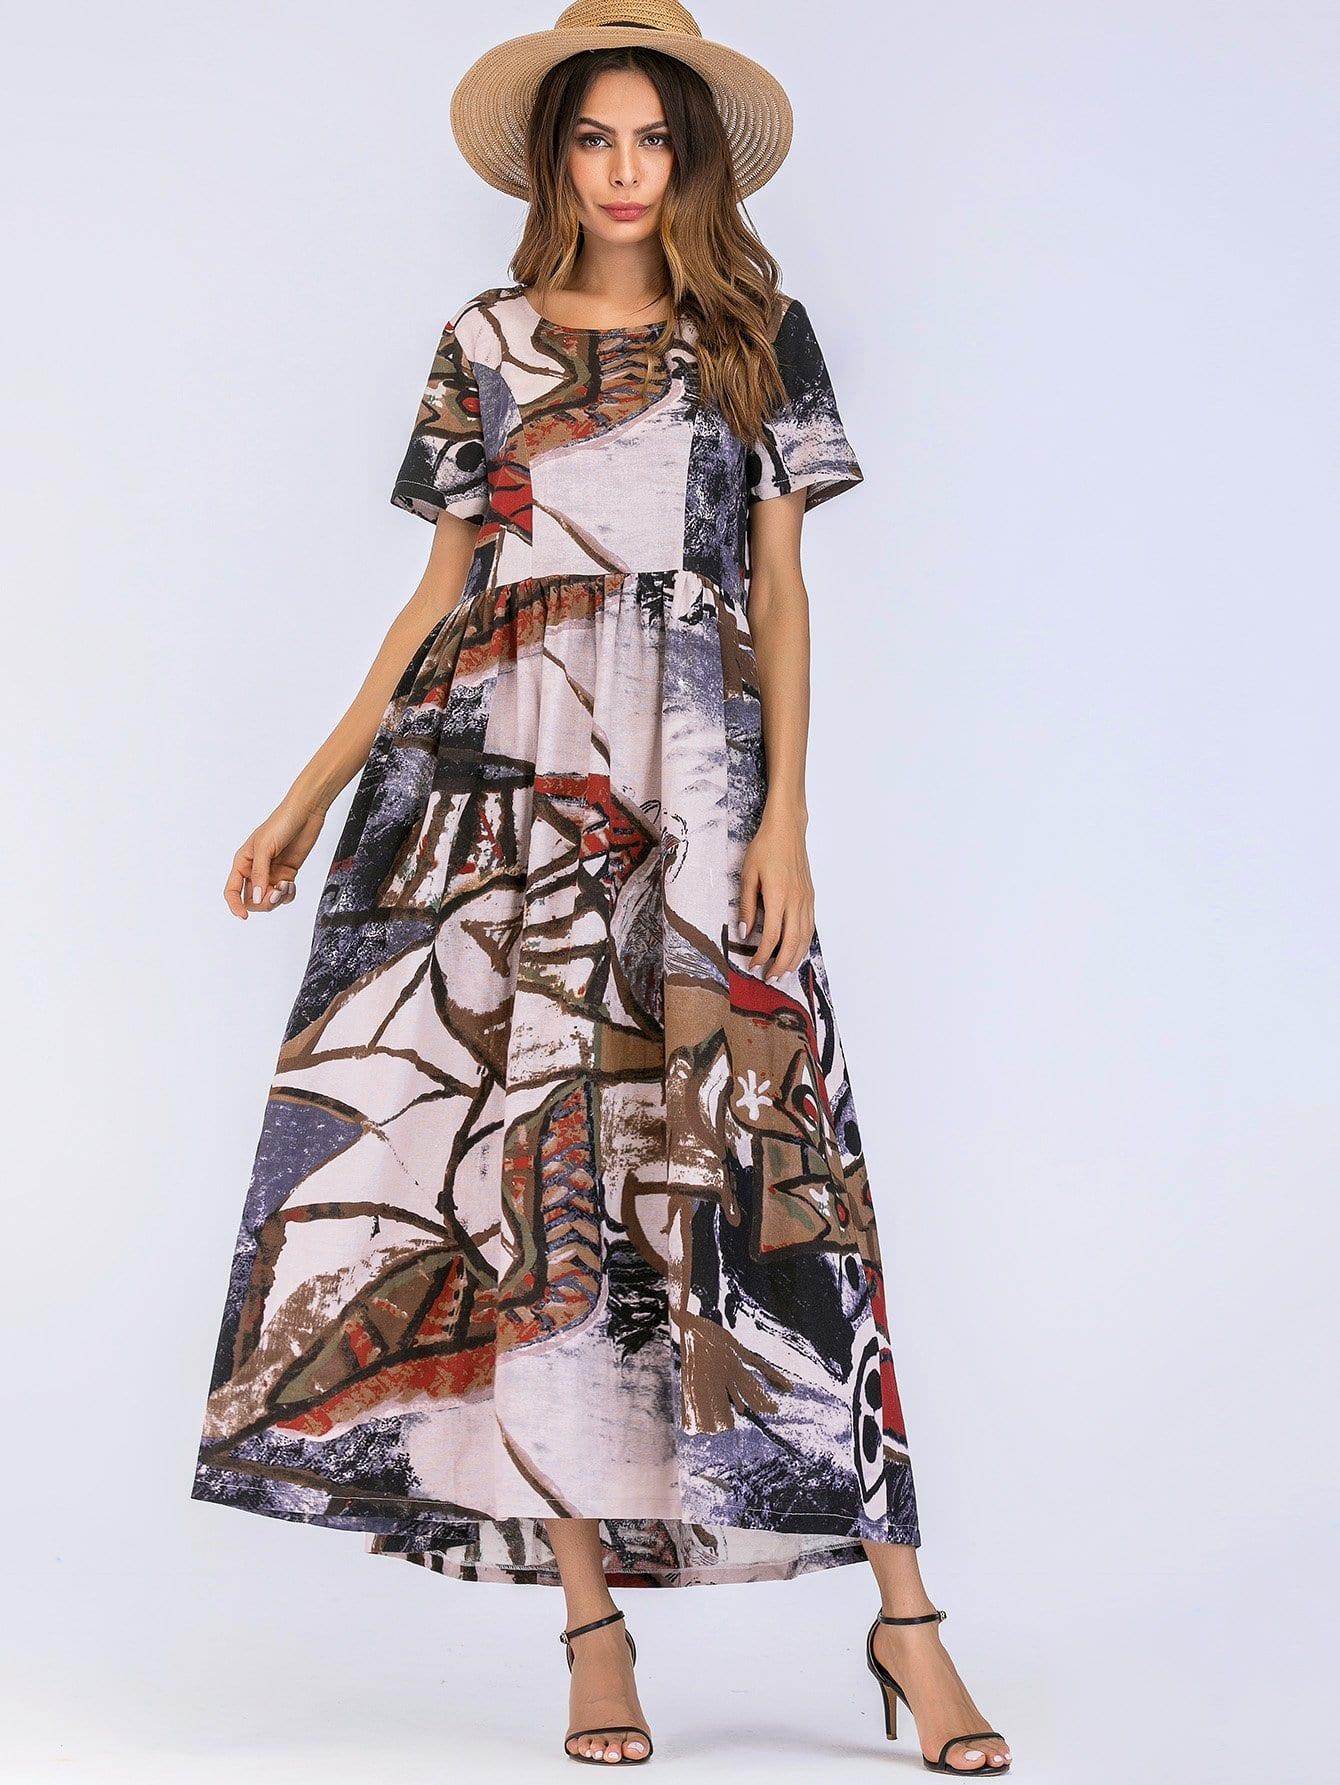 Graffiti Print Longline Dress landscape print longline dress